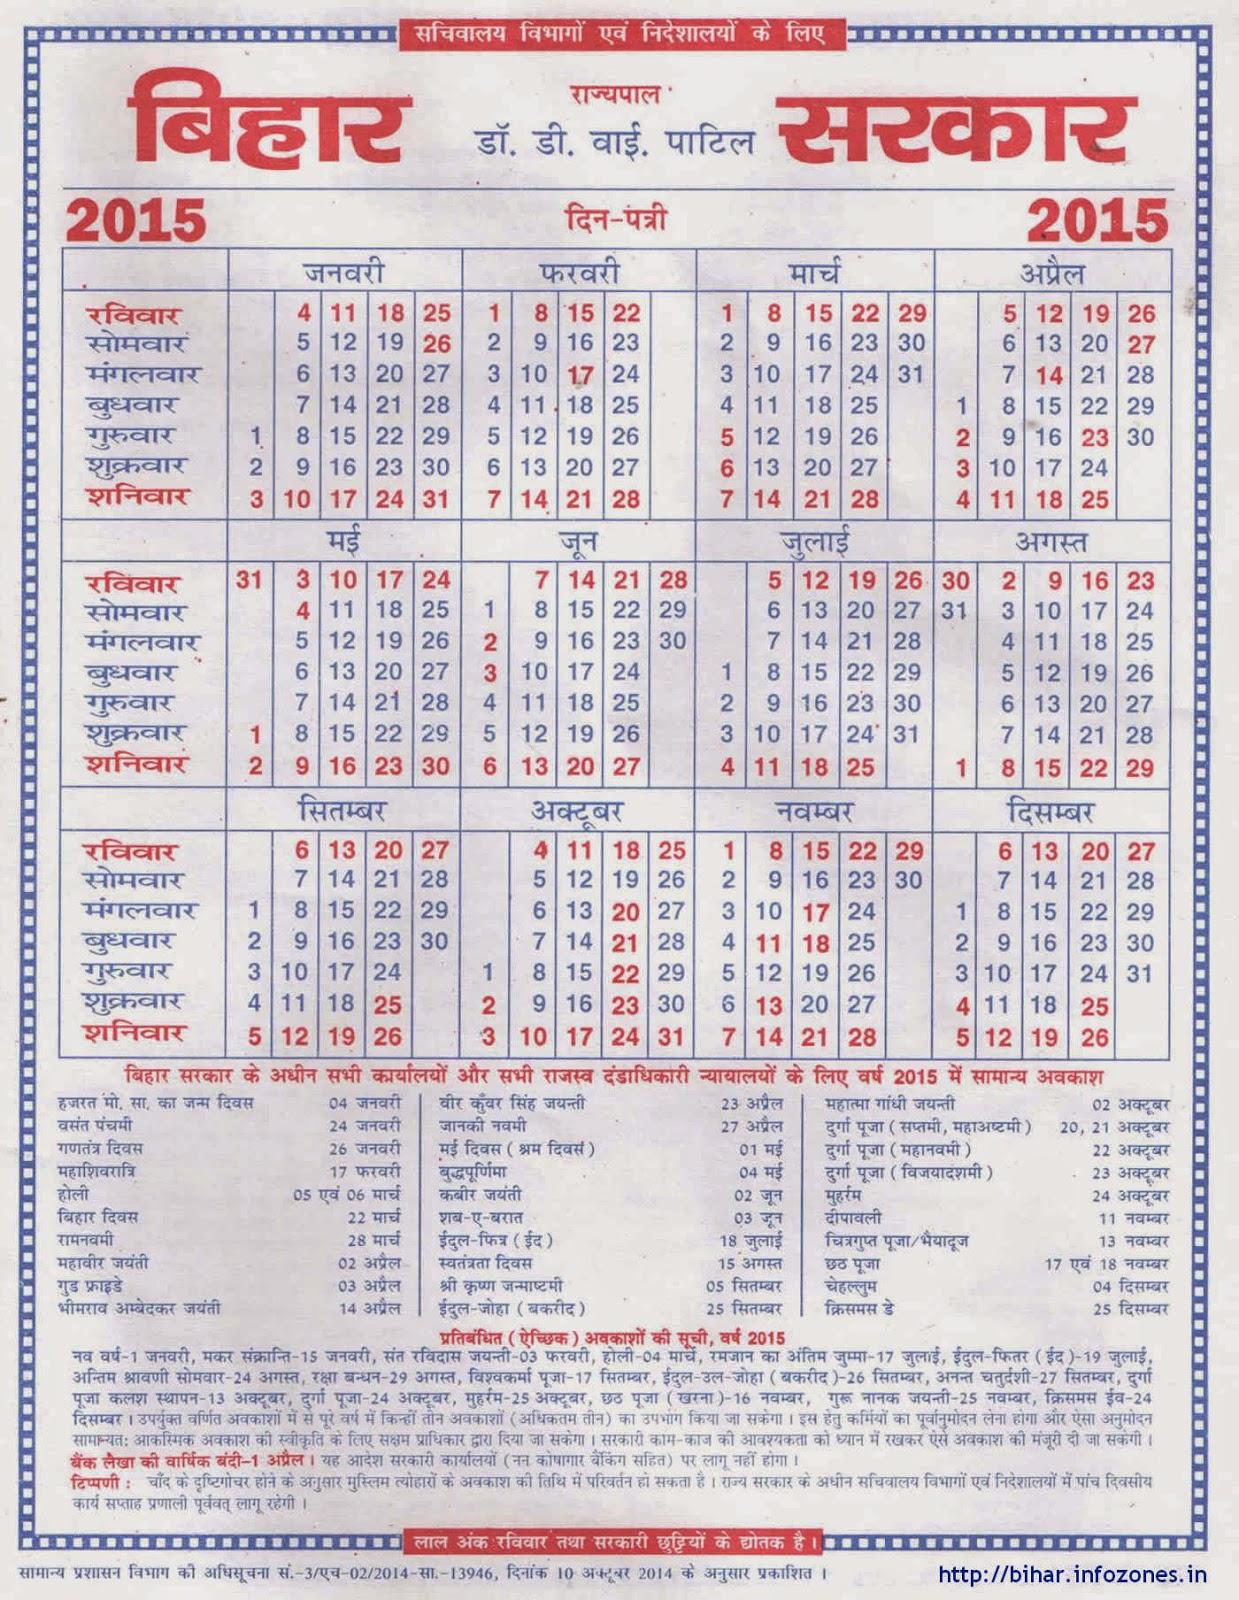 Bihar Government Calendar 2015 with regard to Bihar Govt. Calendar